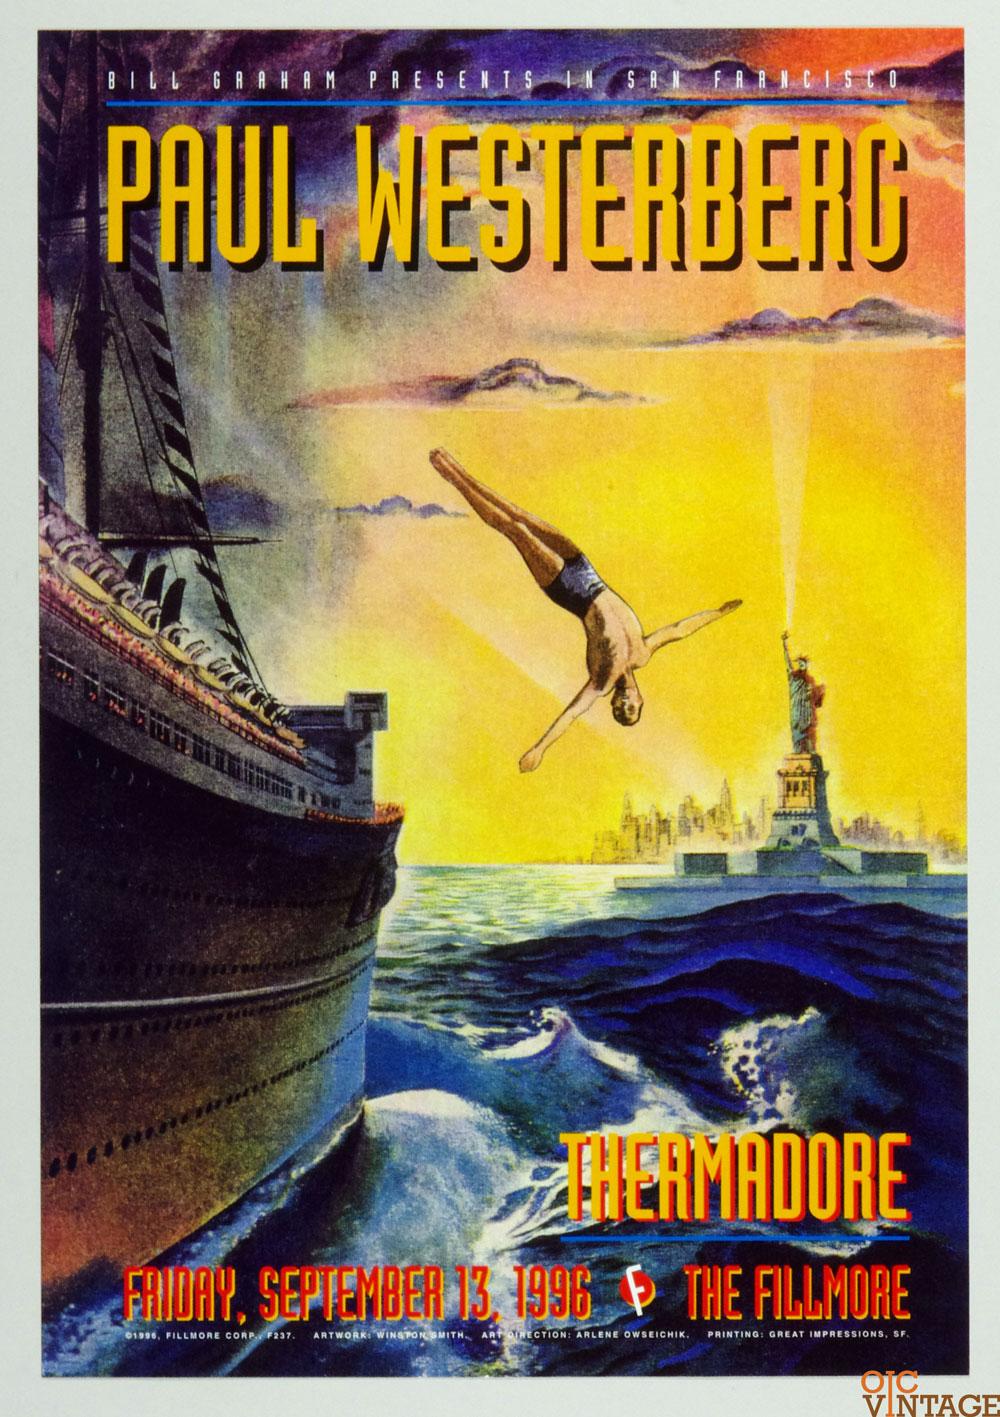 New Fillmore F237 Poster Paul Westerberg Thermadore 1996 Sep 13